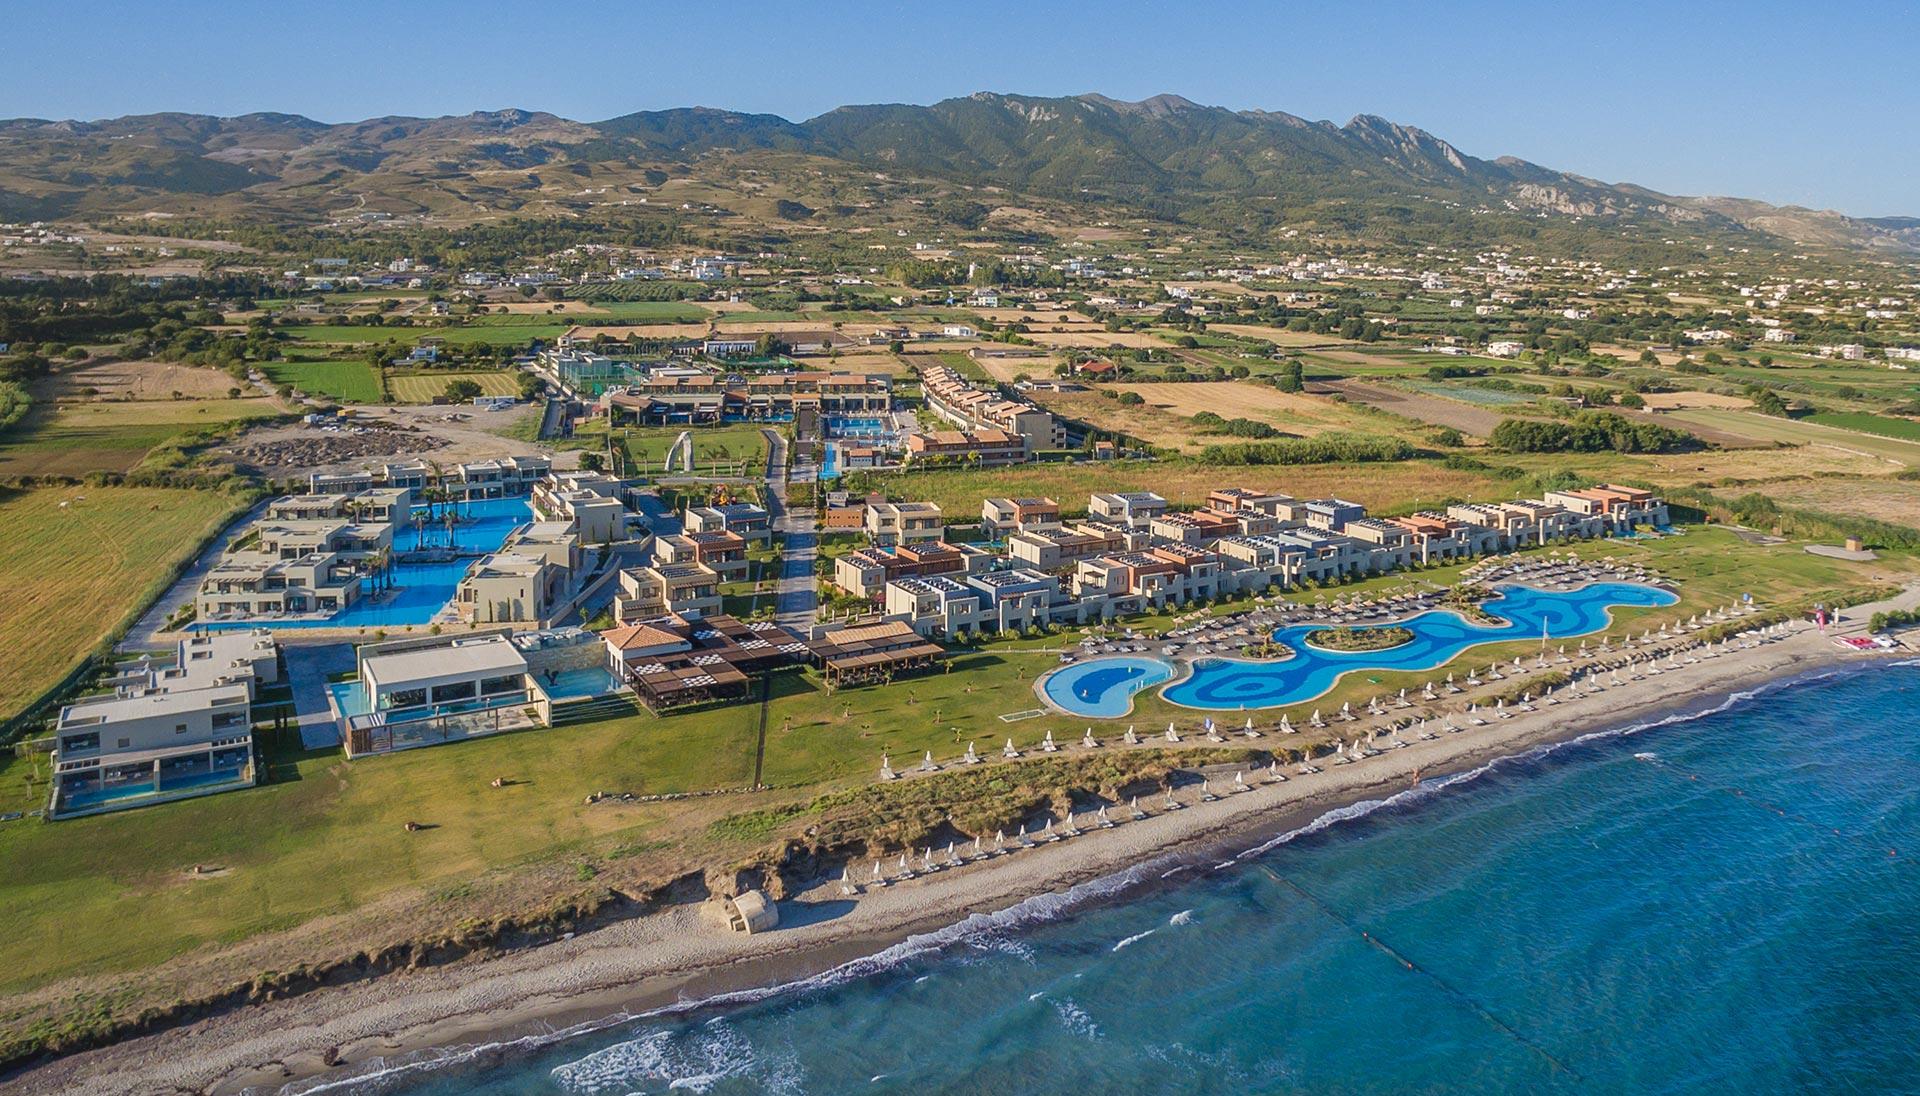 Aerial Photography Kos Island